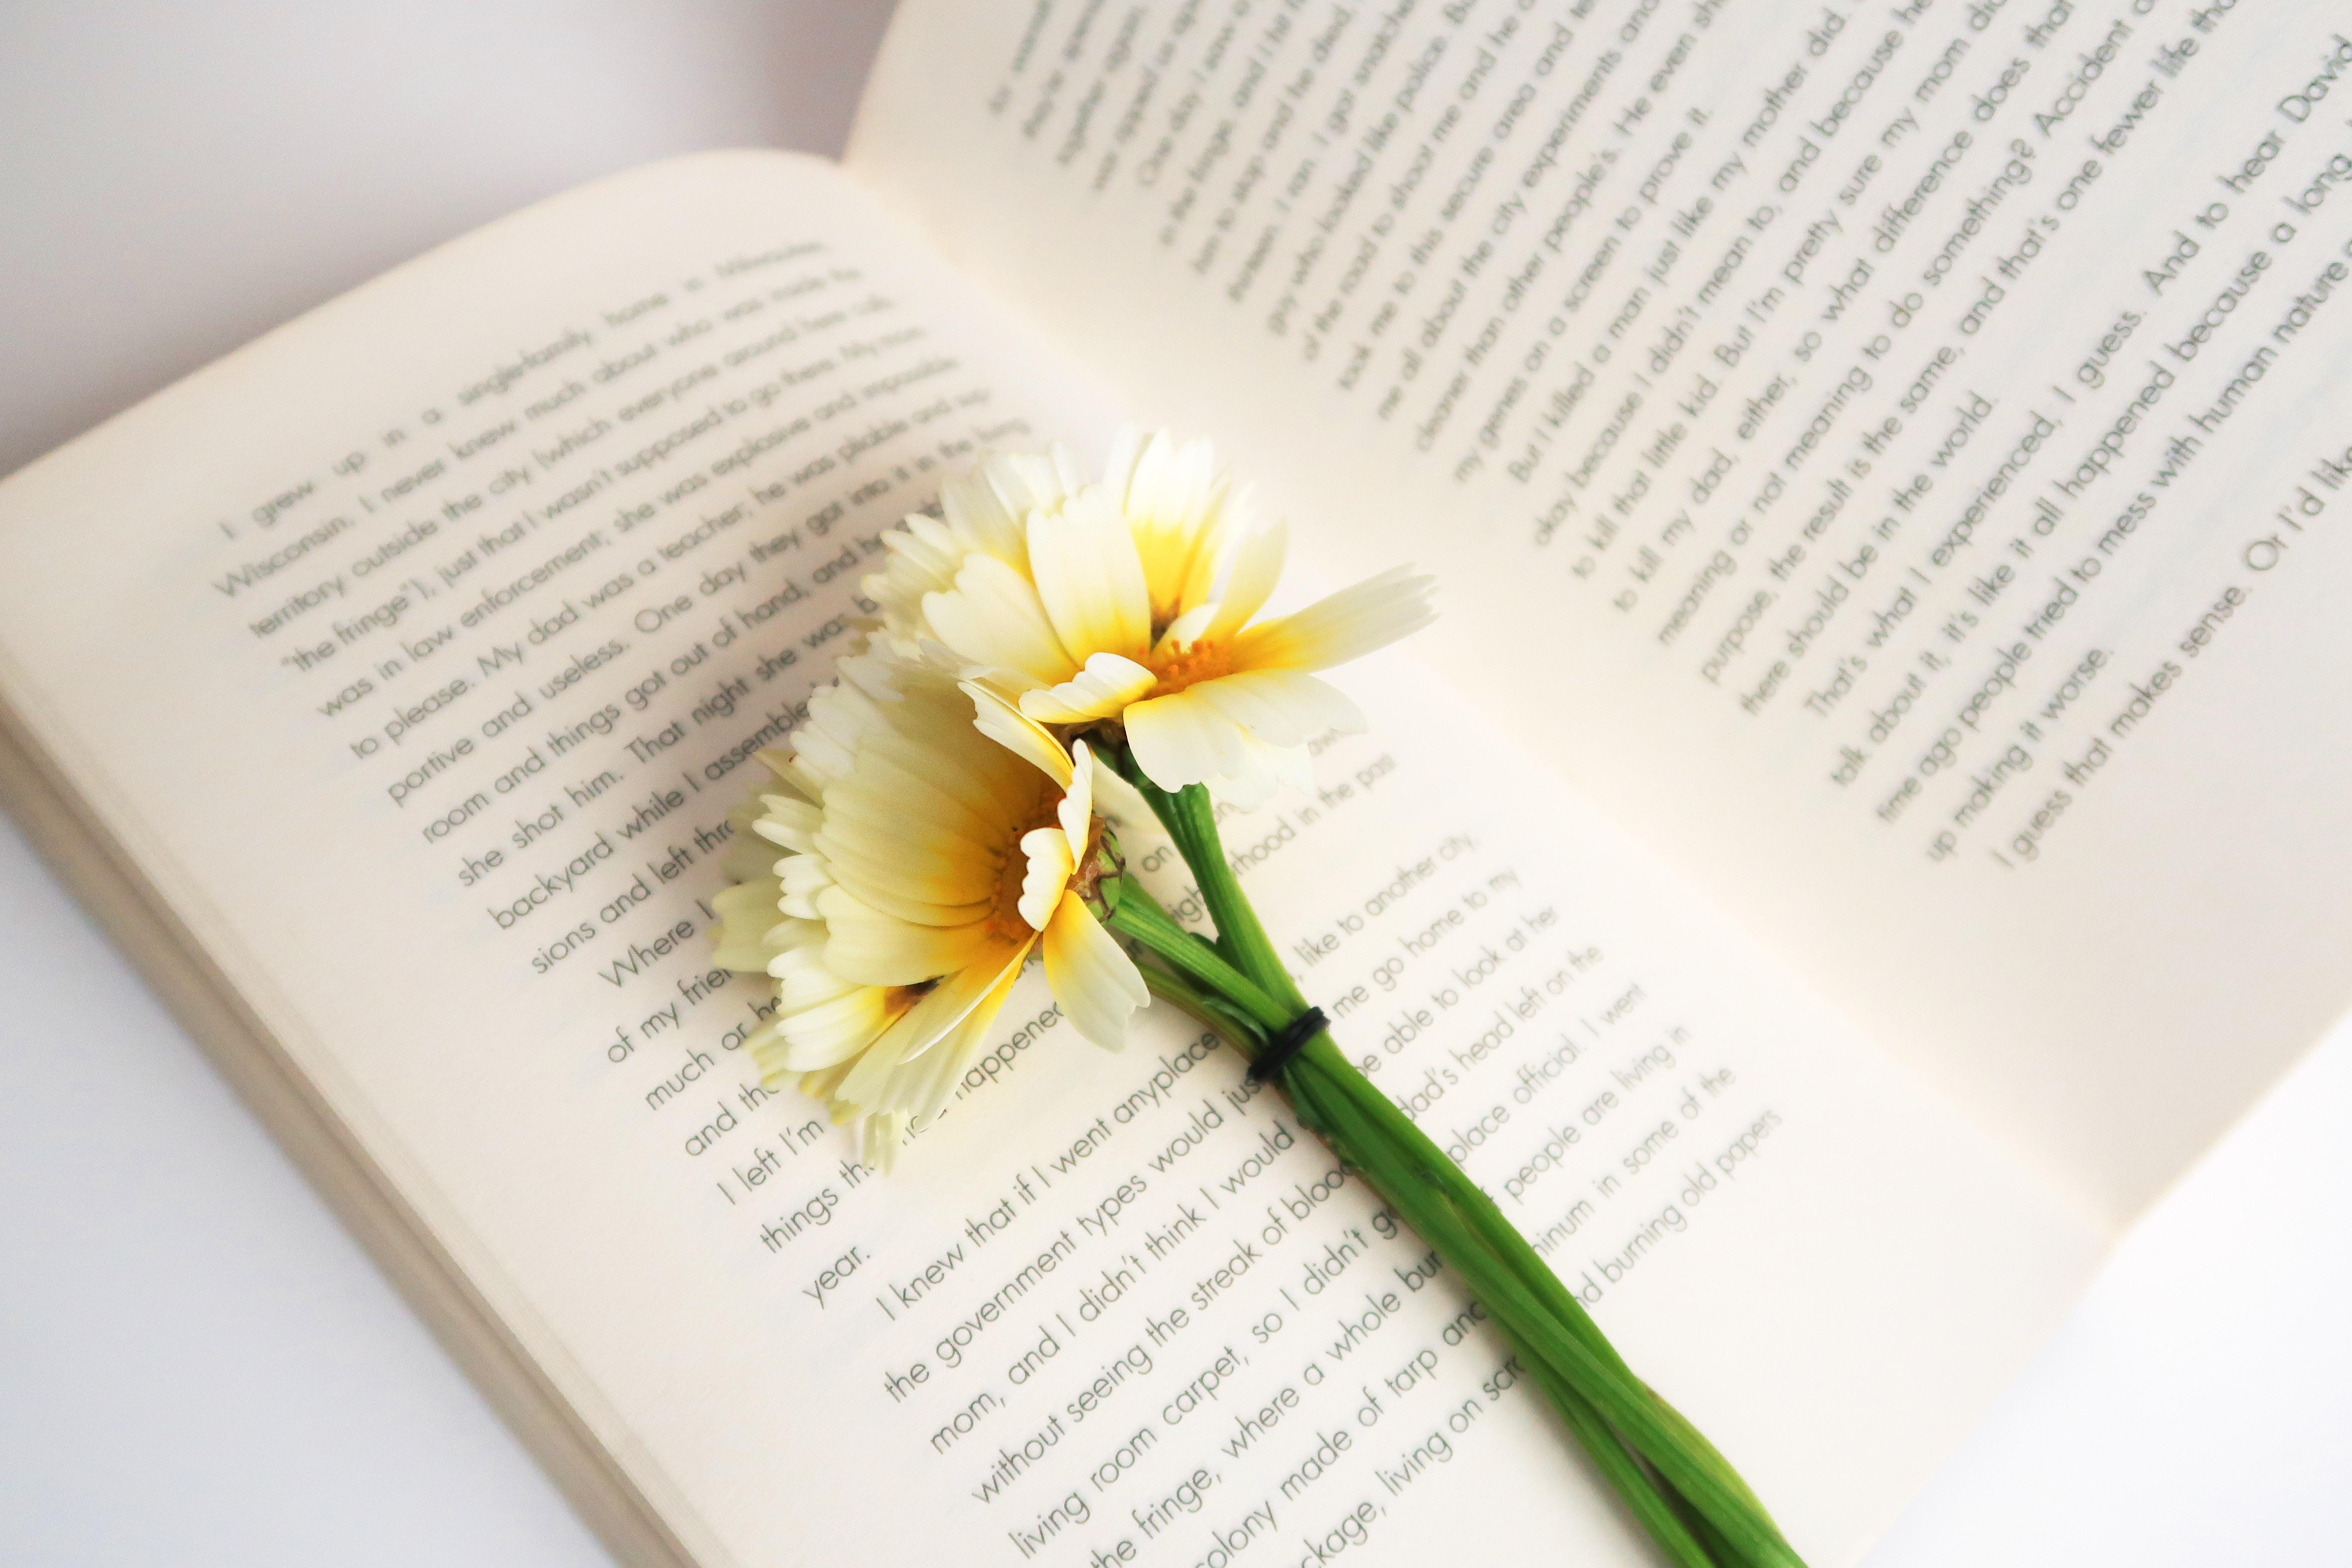 Education Books For Spring